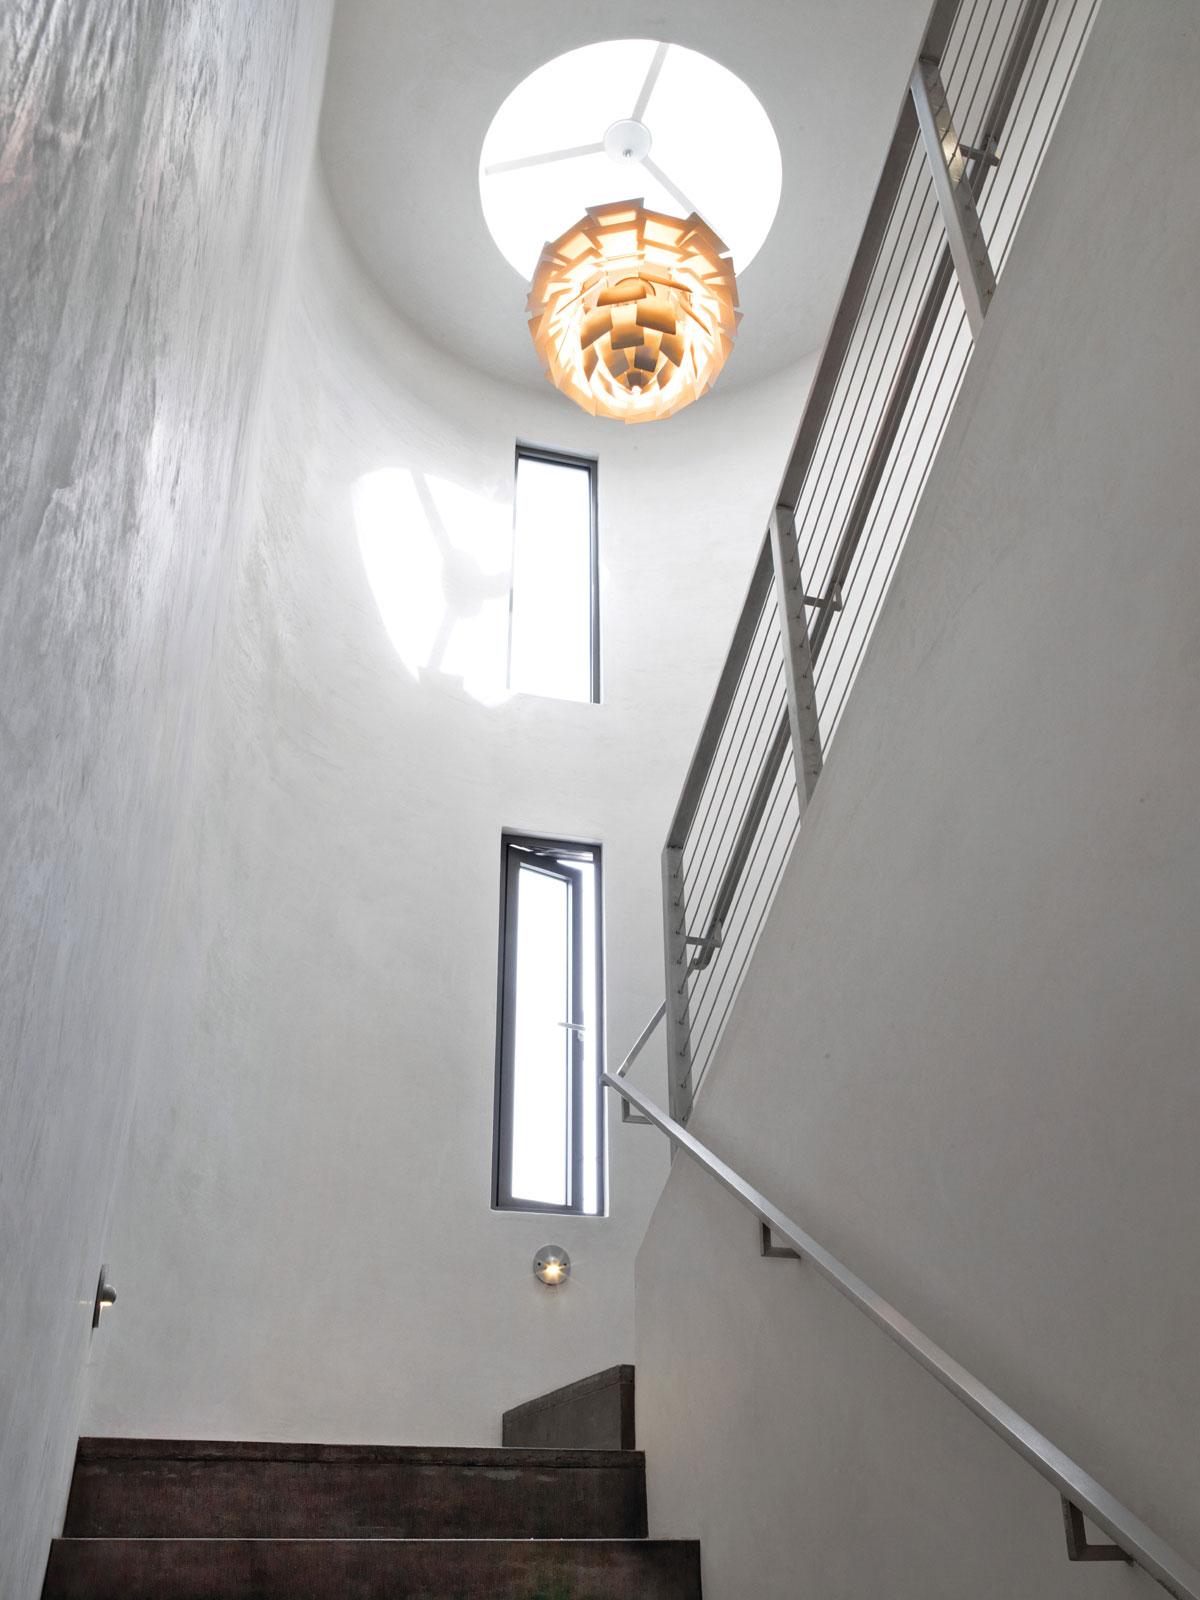 Stairway, Lighting, Eco-Friendly Beach House in California